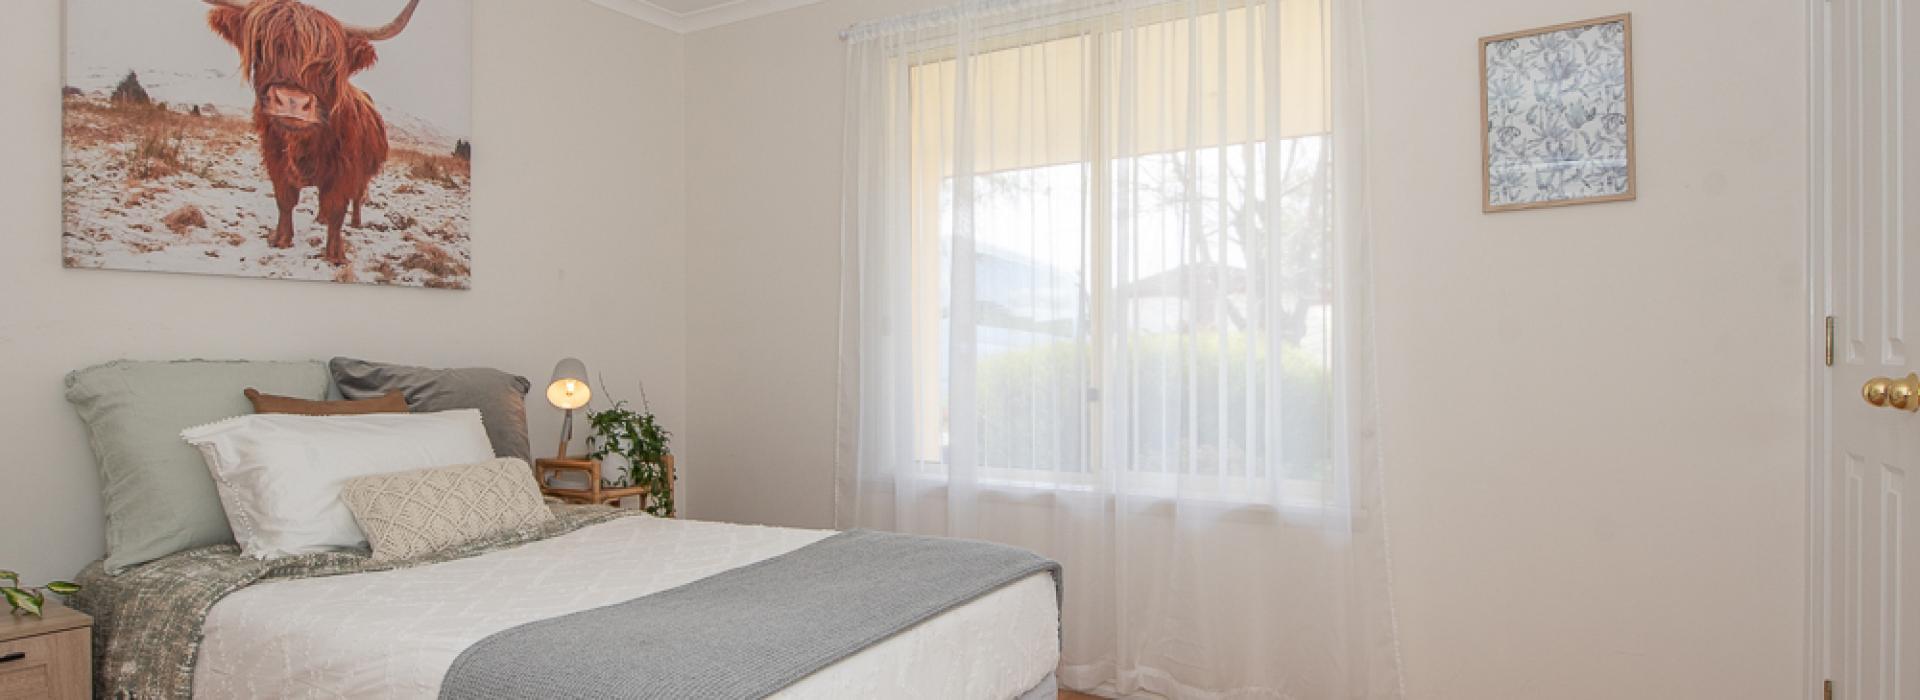 Flanagan Residential | For Sale | Rae Smith | Legana